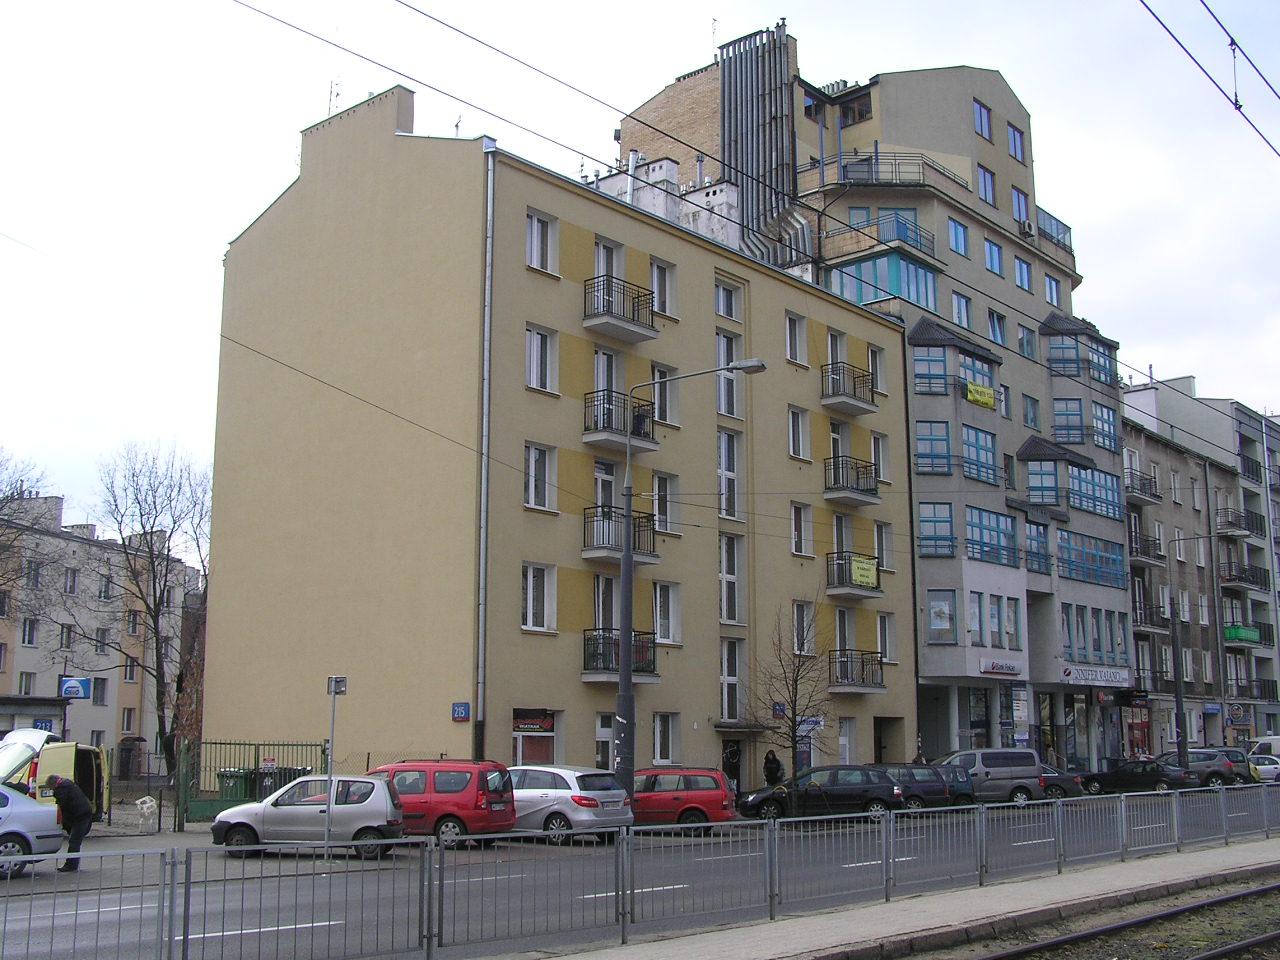 Grochowska 215